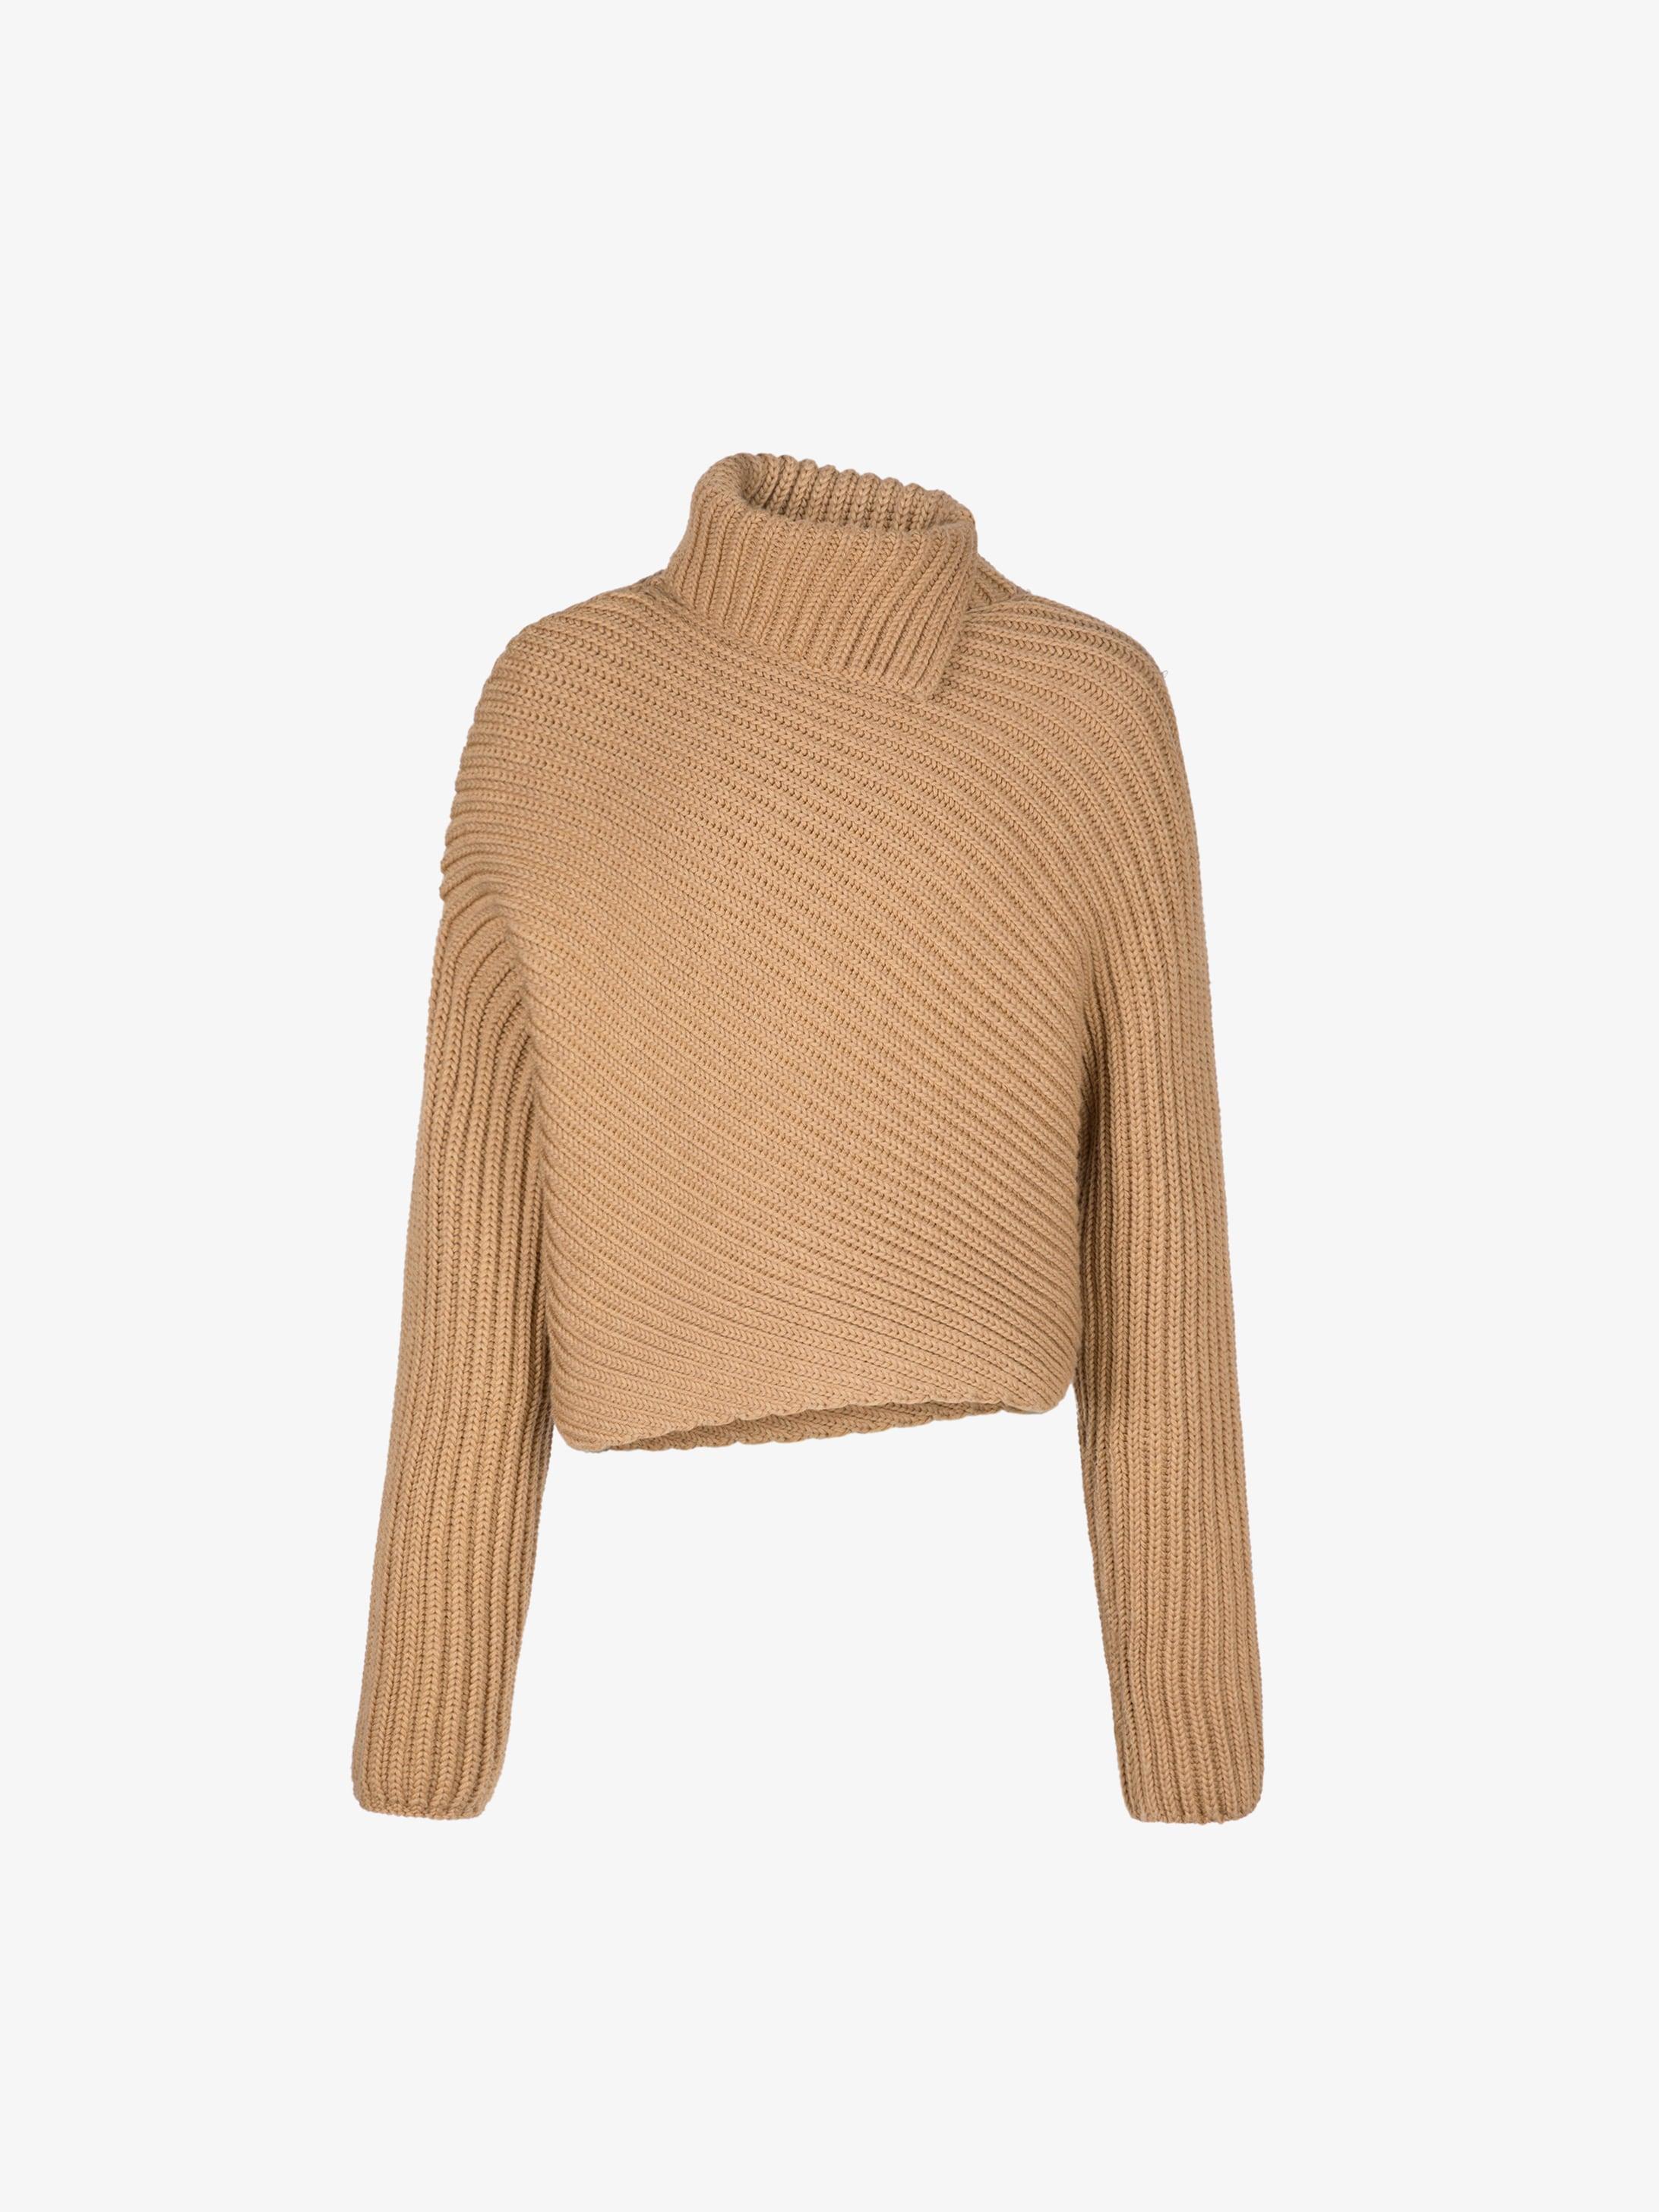 Asymmetric turtleneck sweater in merino